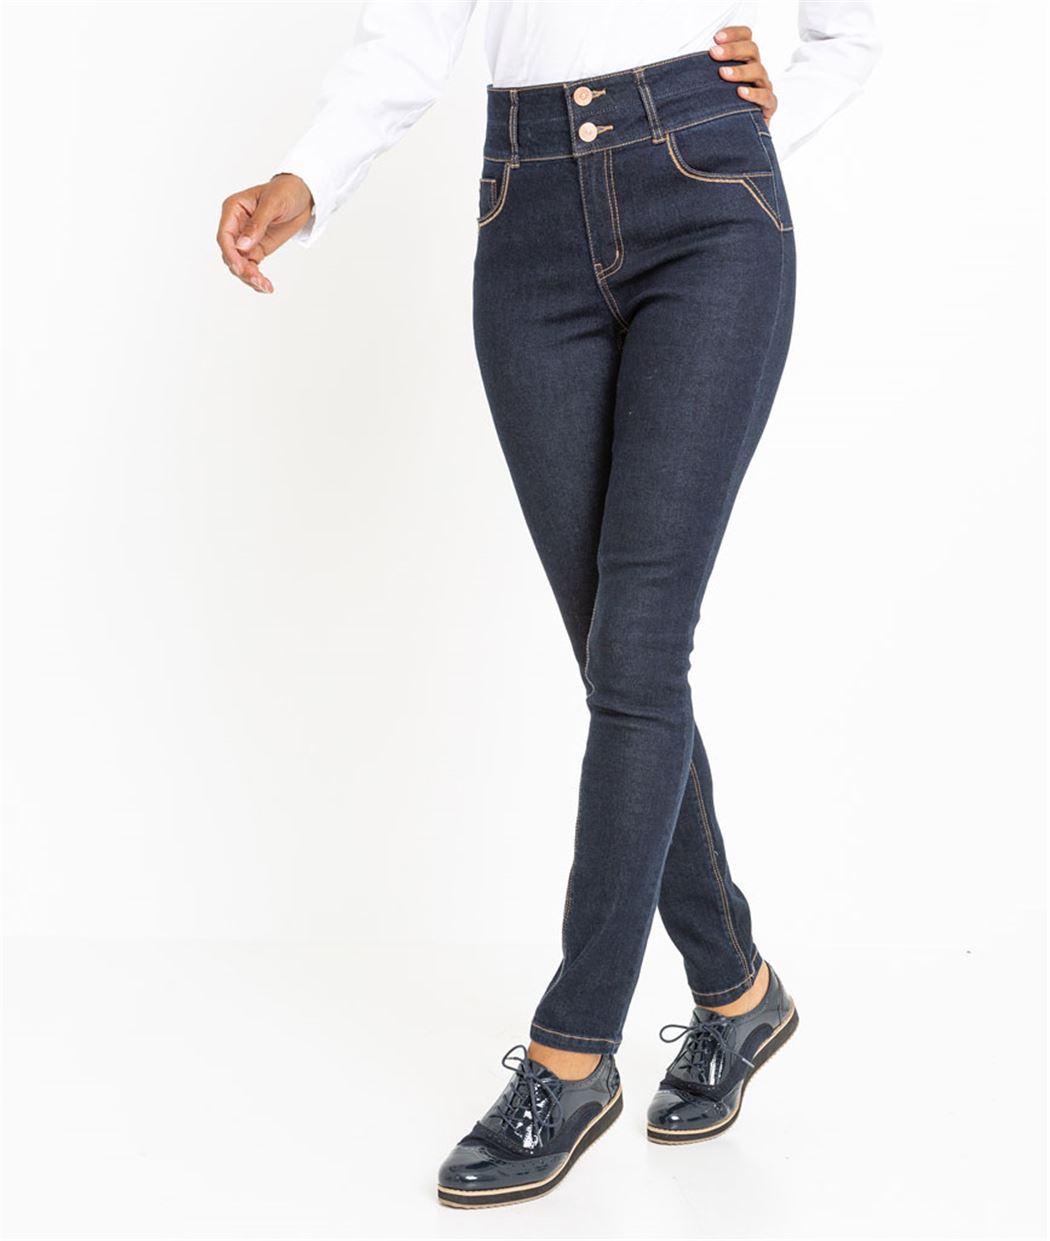 jean femme slim taille haute push up brut grain de malice. Black Bedroom Furniture Sets. Home Design Ideas